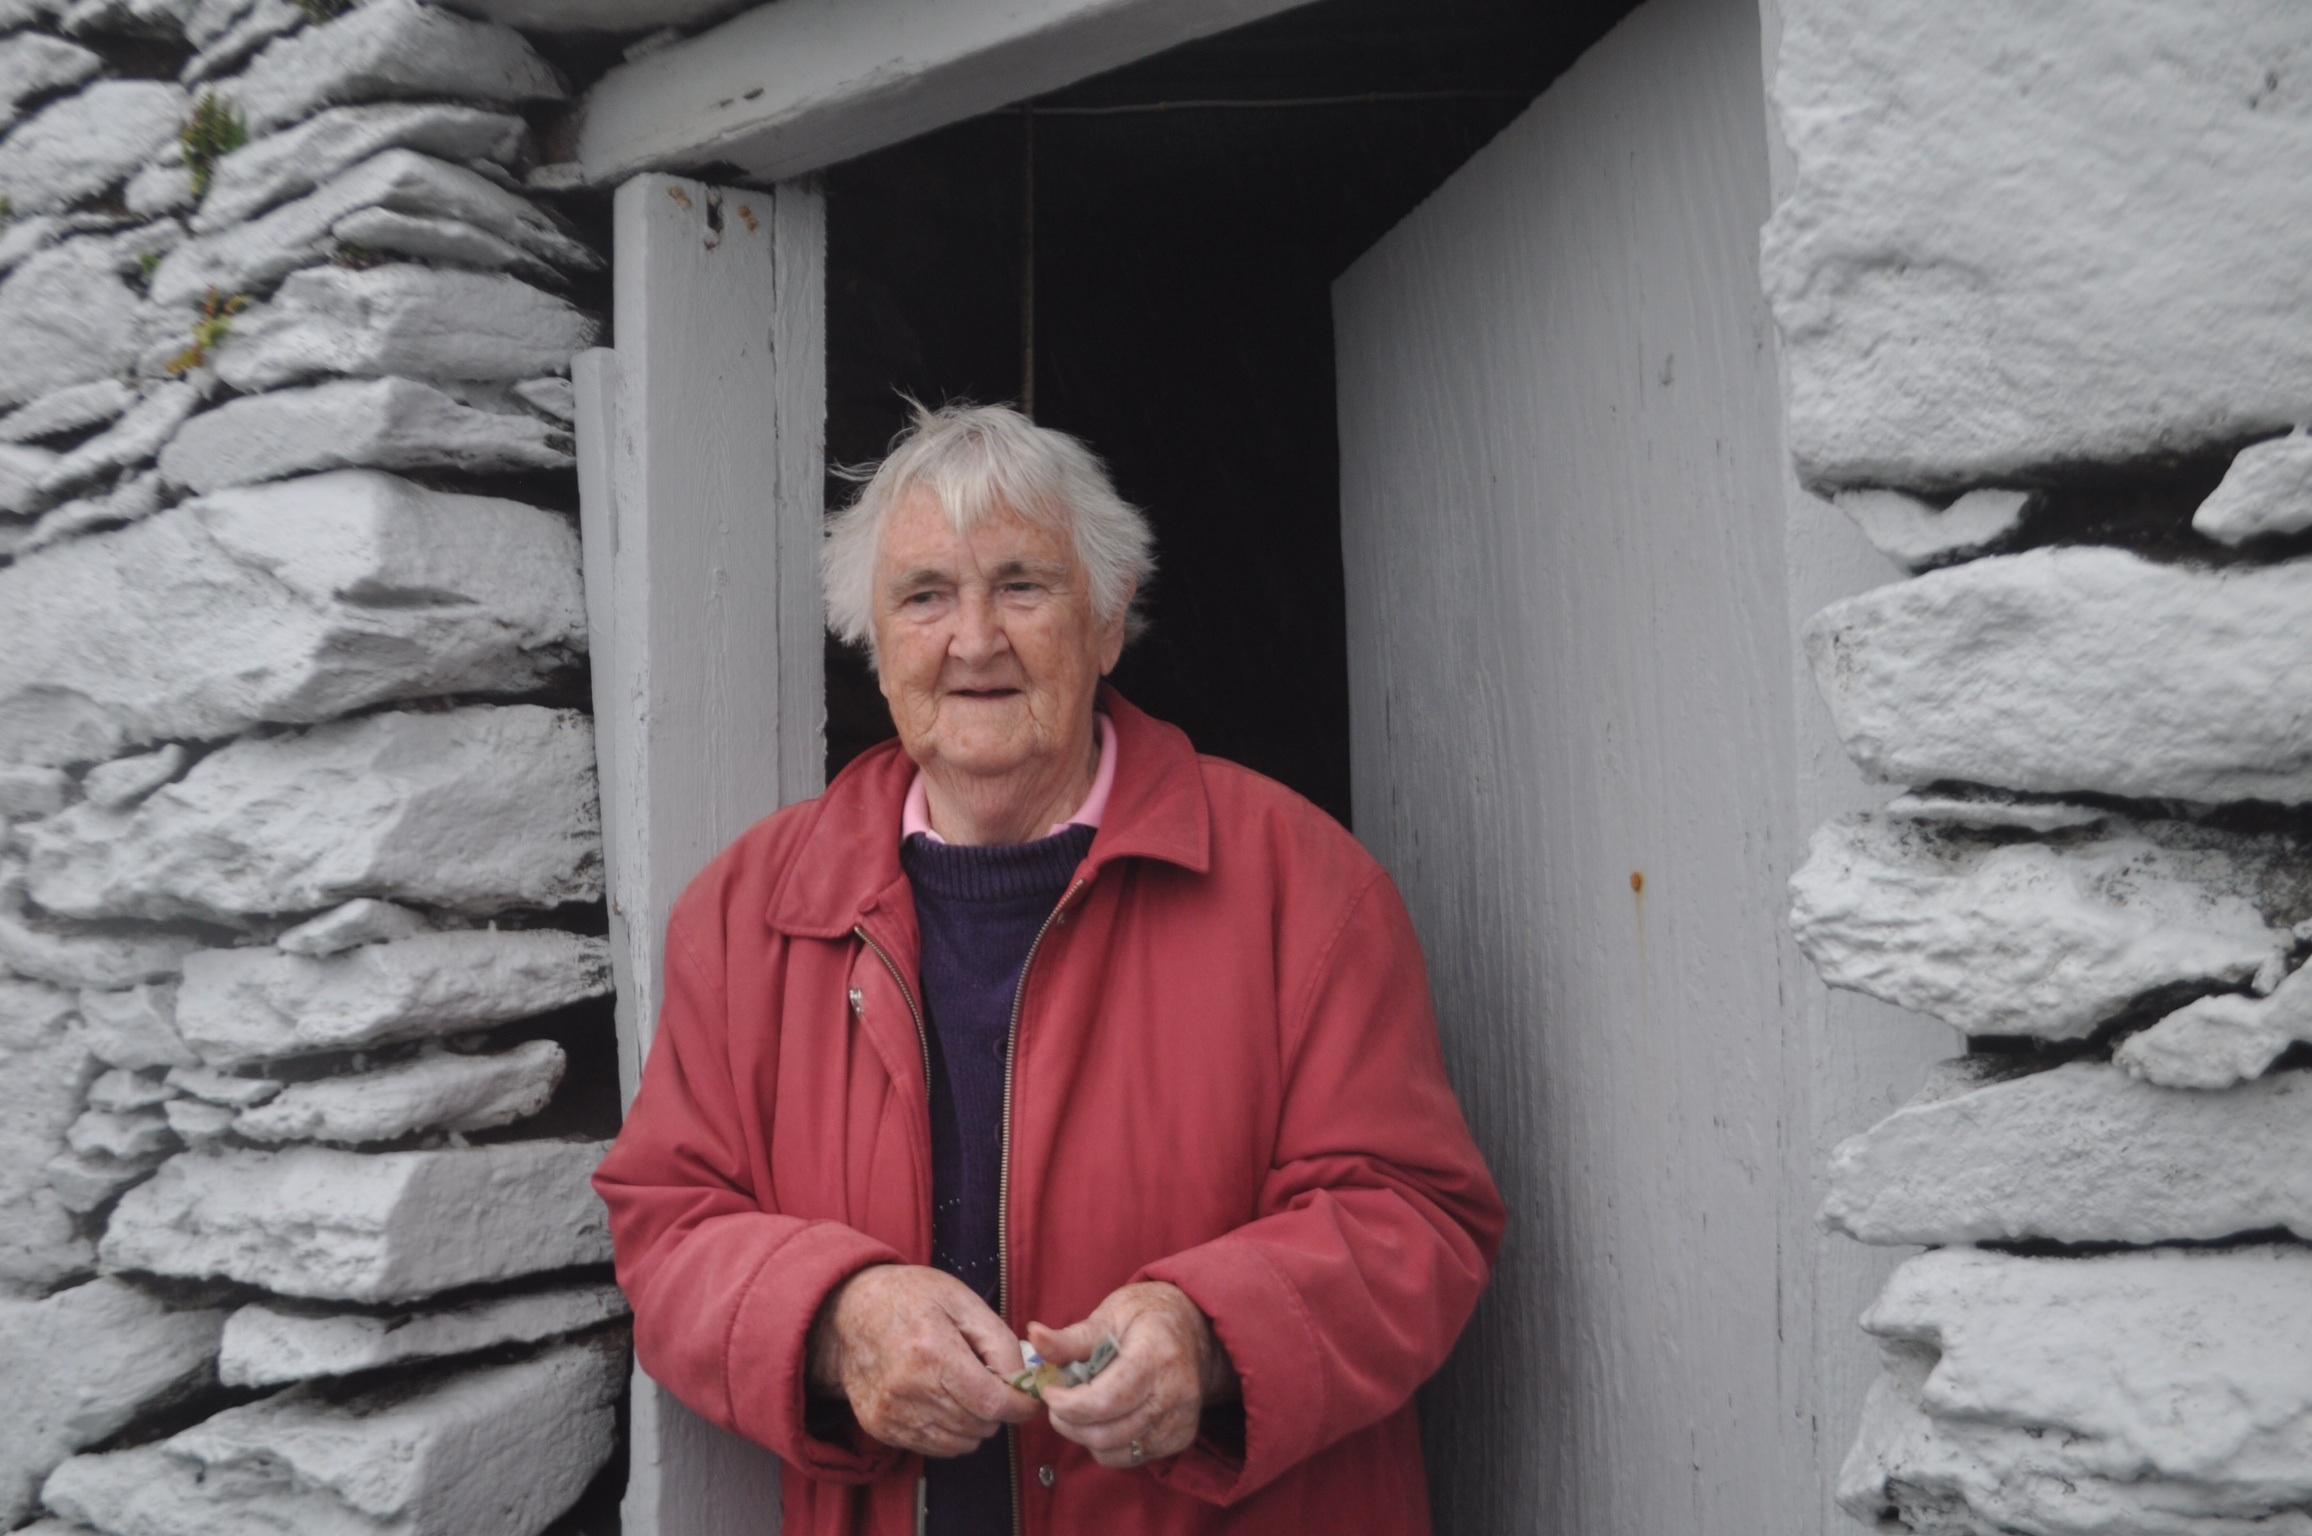 Mary, Keeper of the Fahan Beehive Huts, County Kerry, Ireland